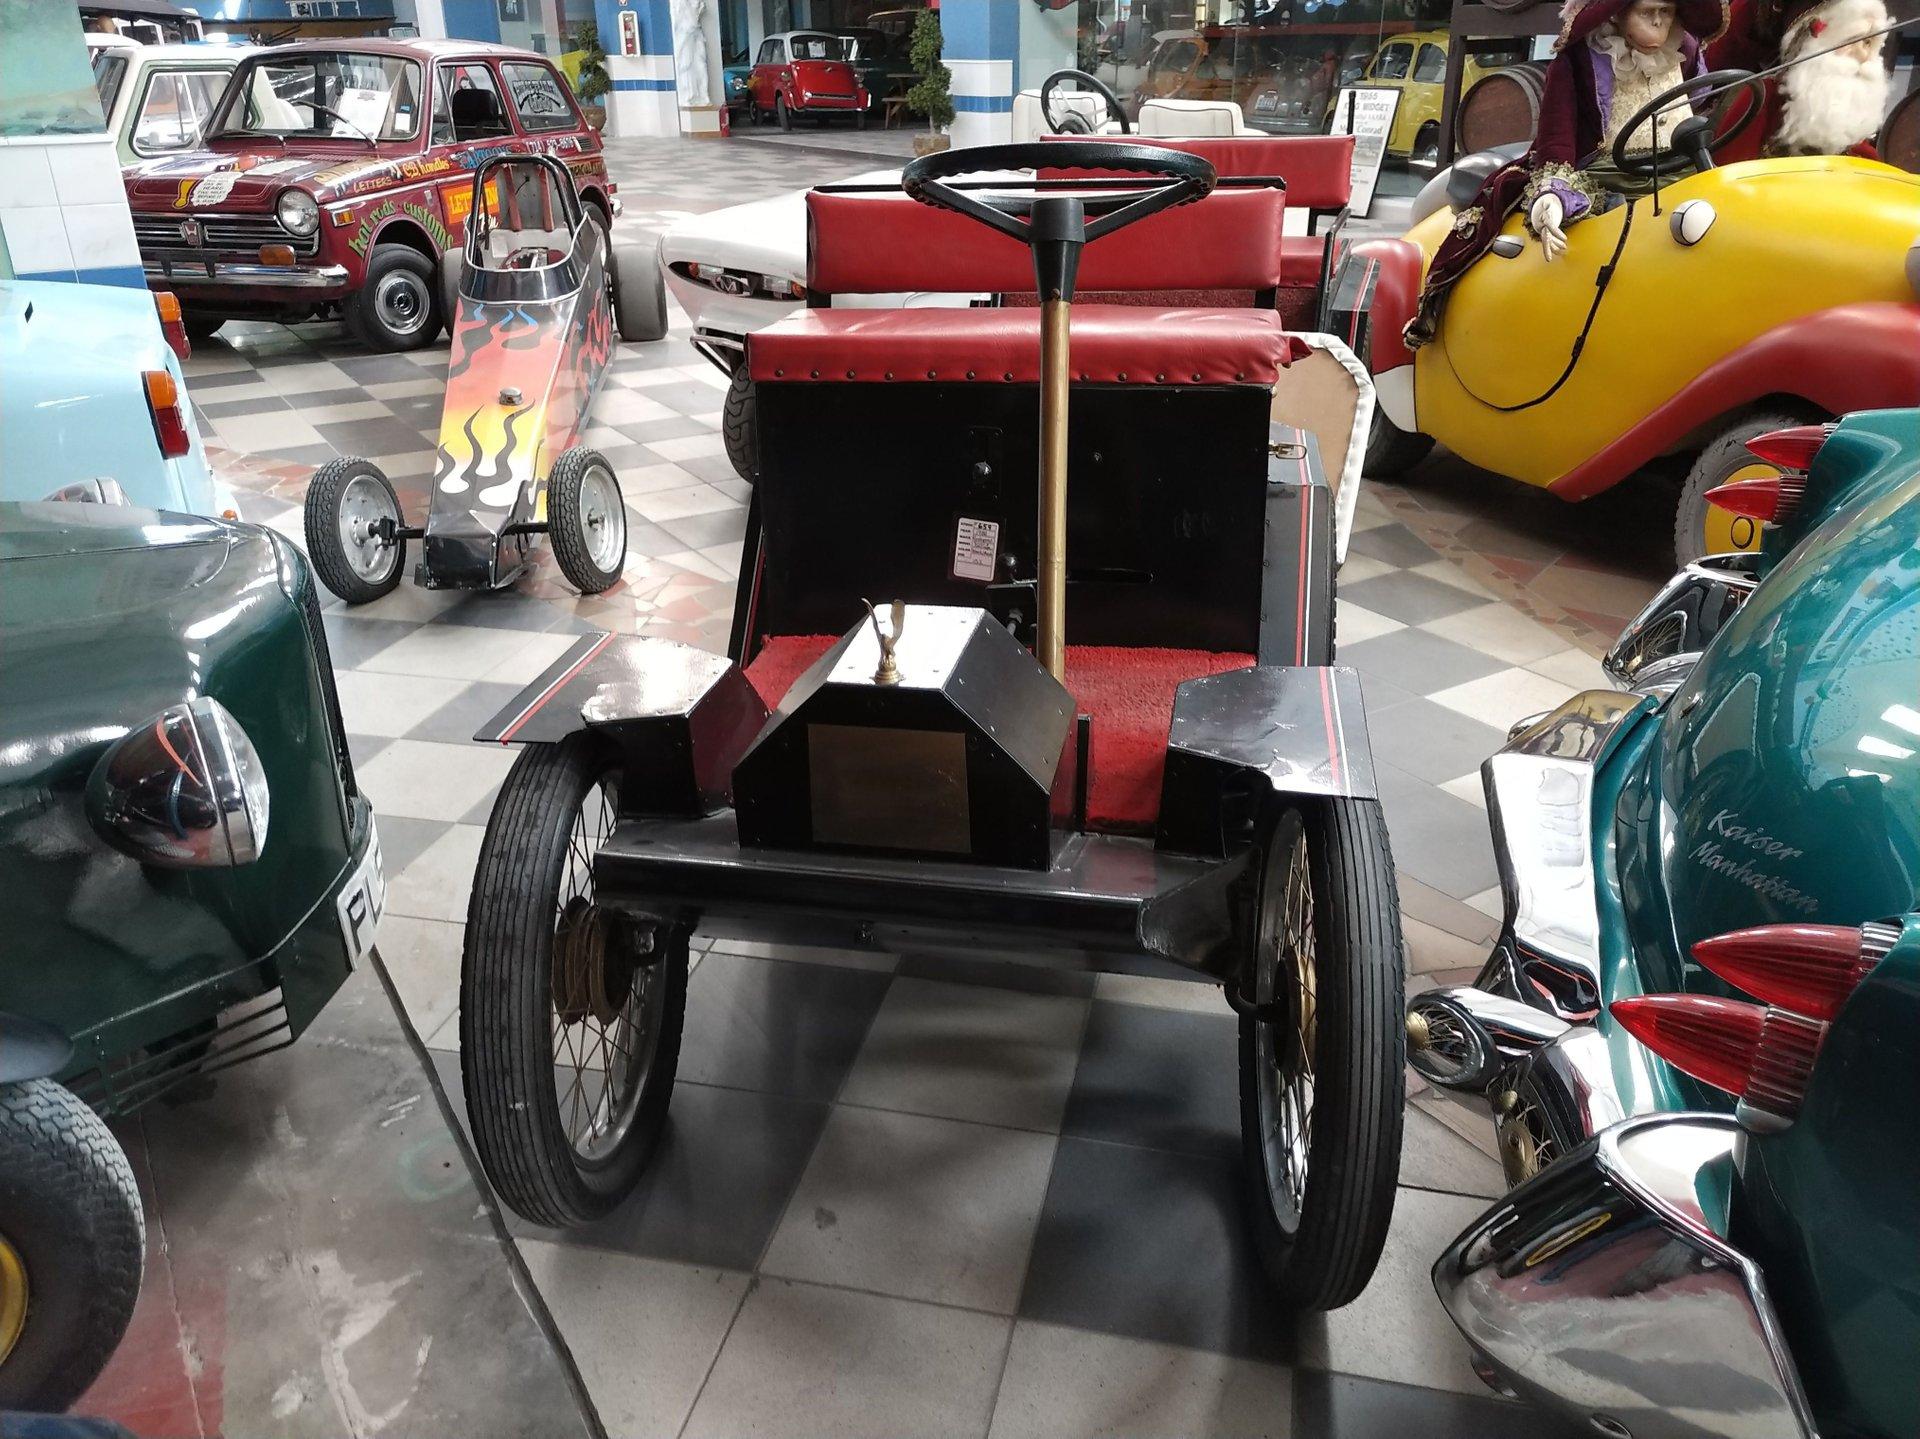 1988 godspeed invalid carriage